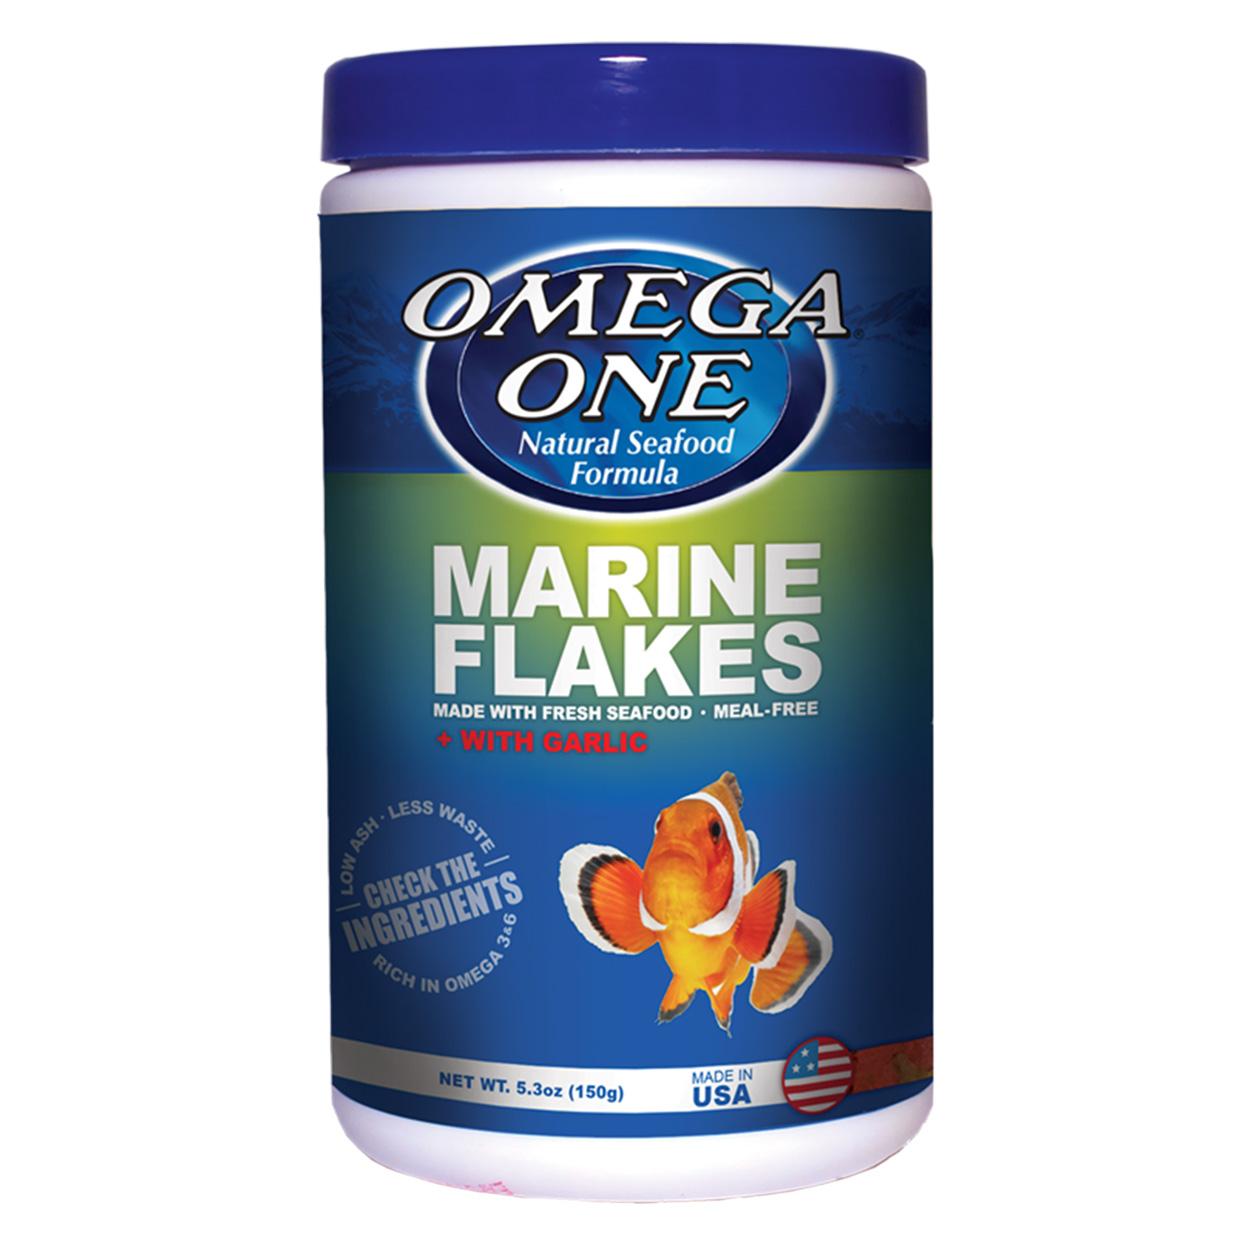 Omega One Marine Flakes with Garlic - 5.3 oz 10618